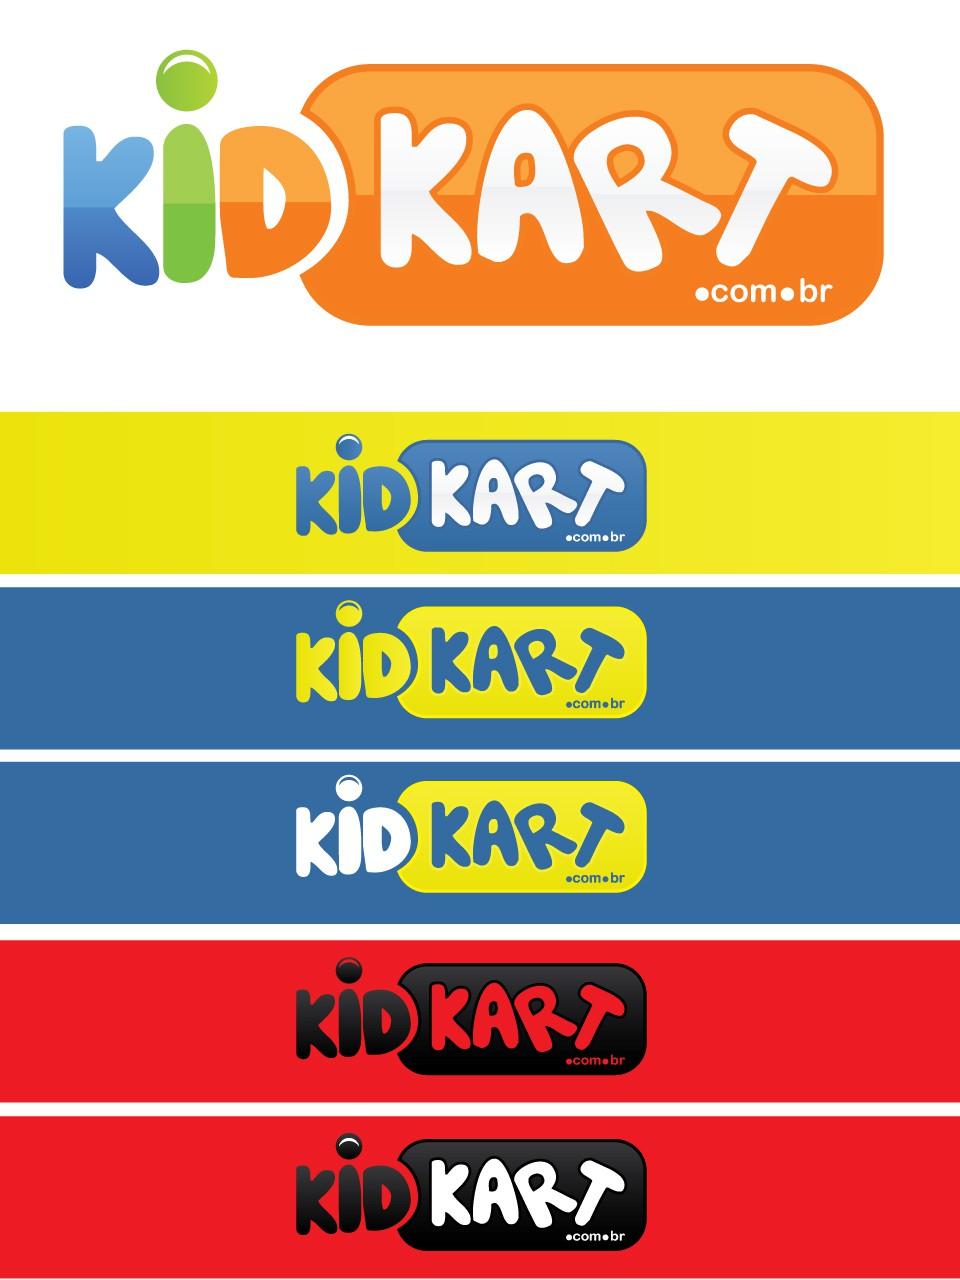 Help Kid Kart.com.br with a new logo